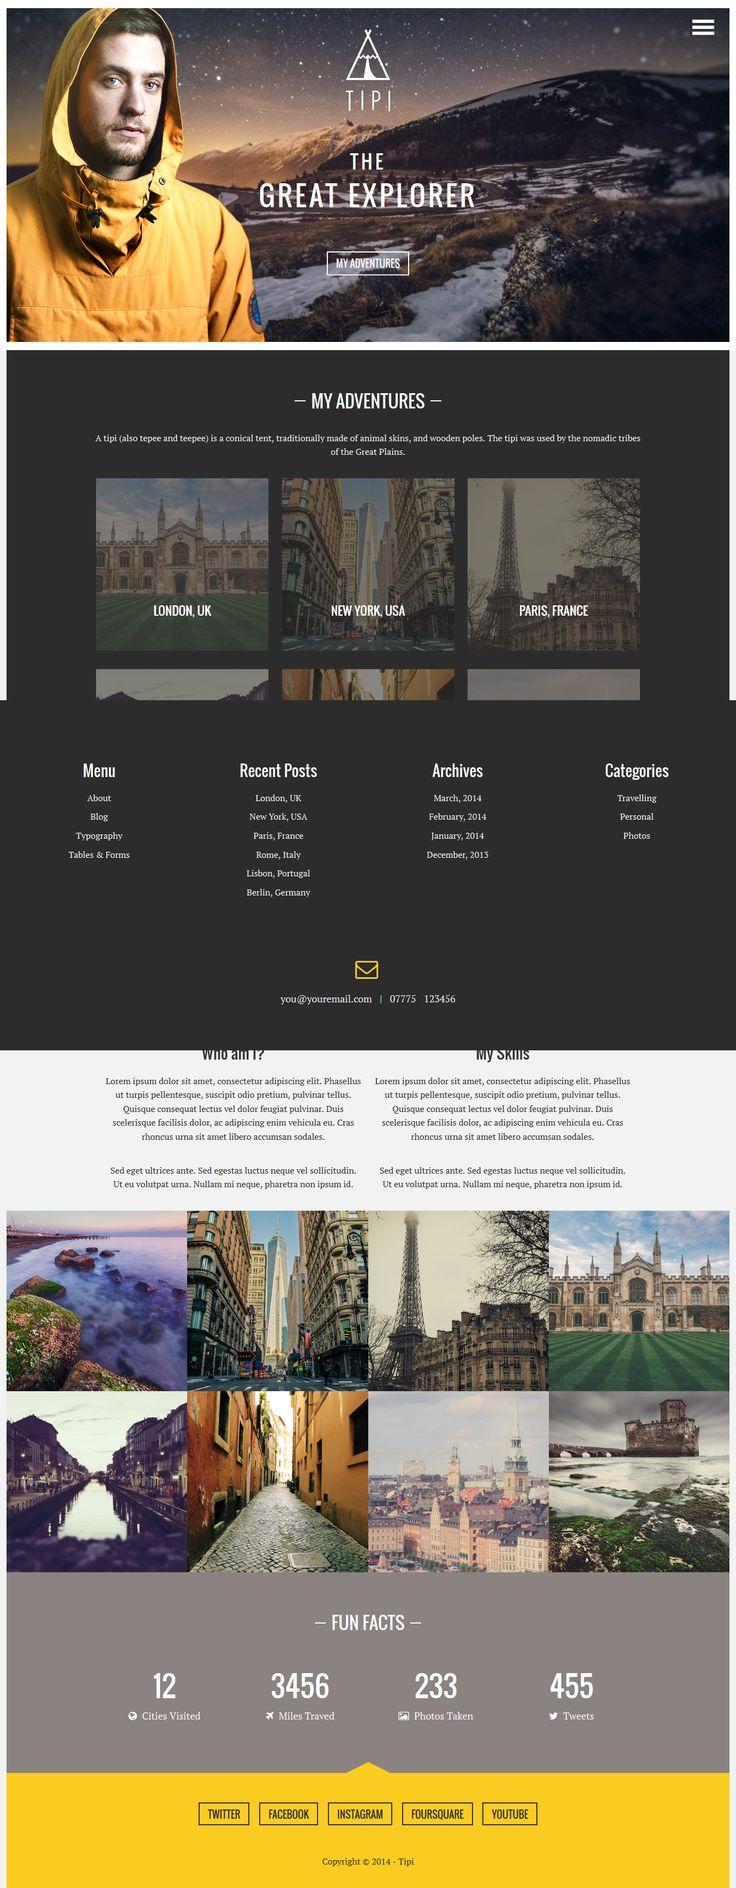 31 best html templates images on Pinterest | Design web, Design ...